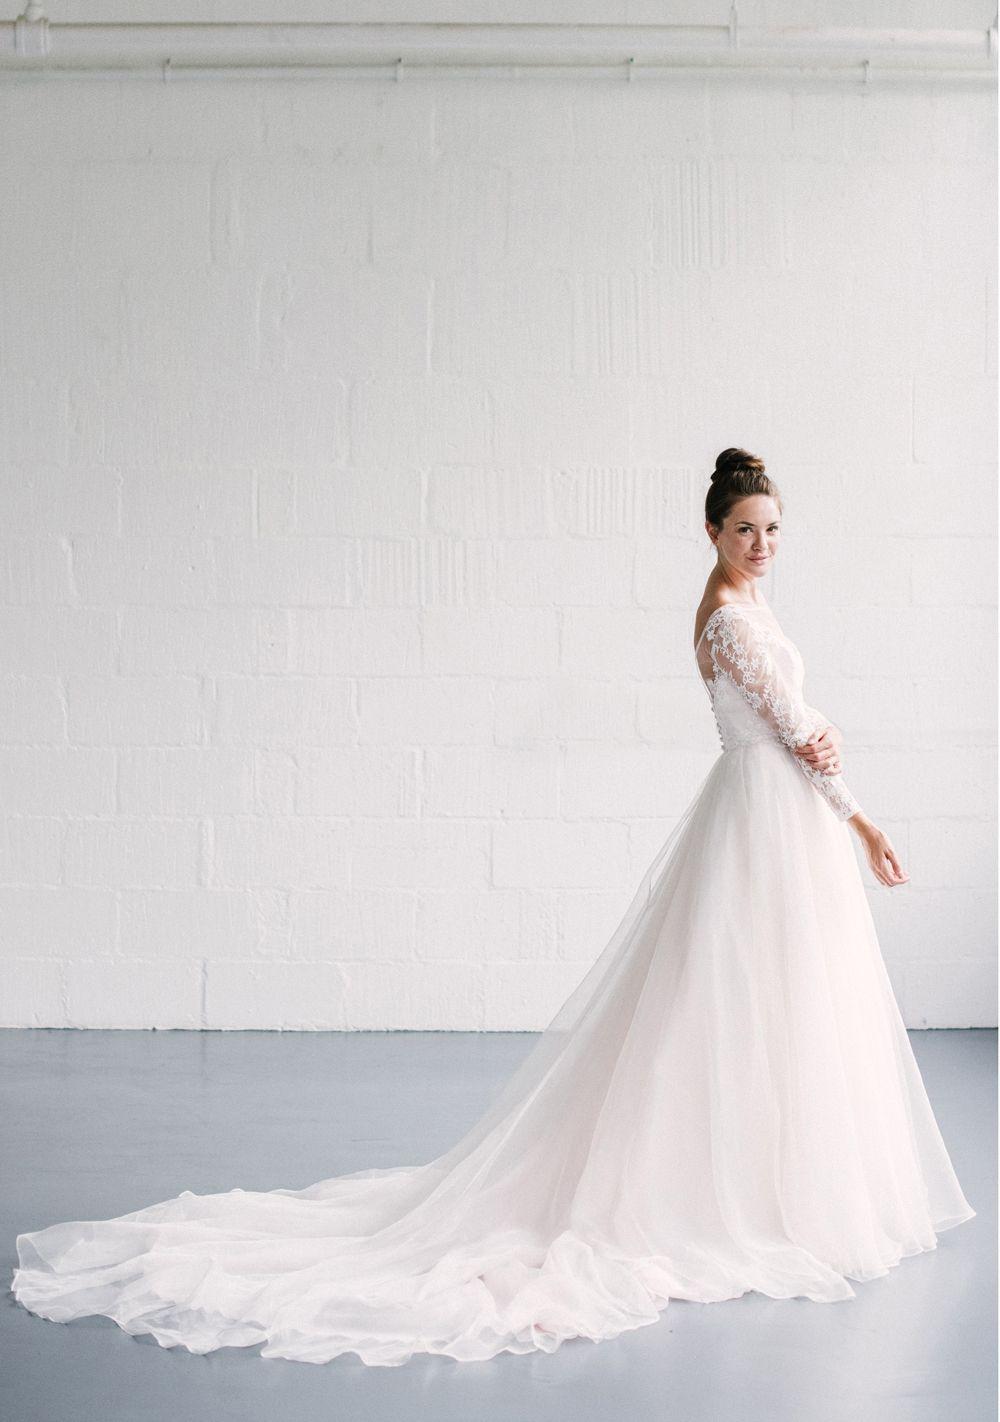 Naomi Neoh Serena wedding dress & Zeta lace Jacket - 2018 Celestial ...